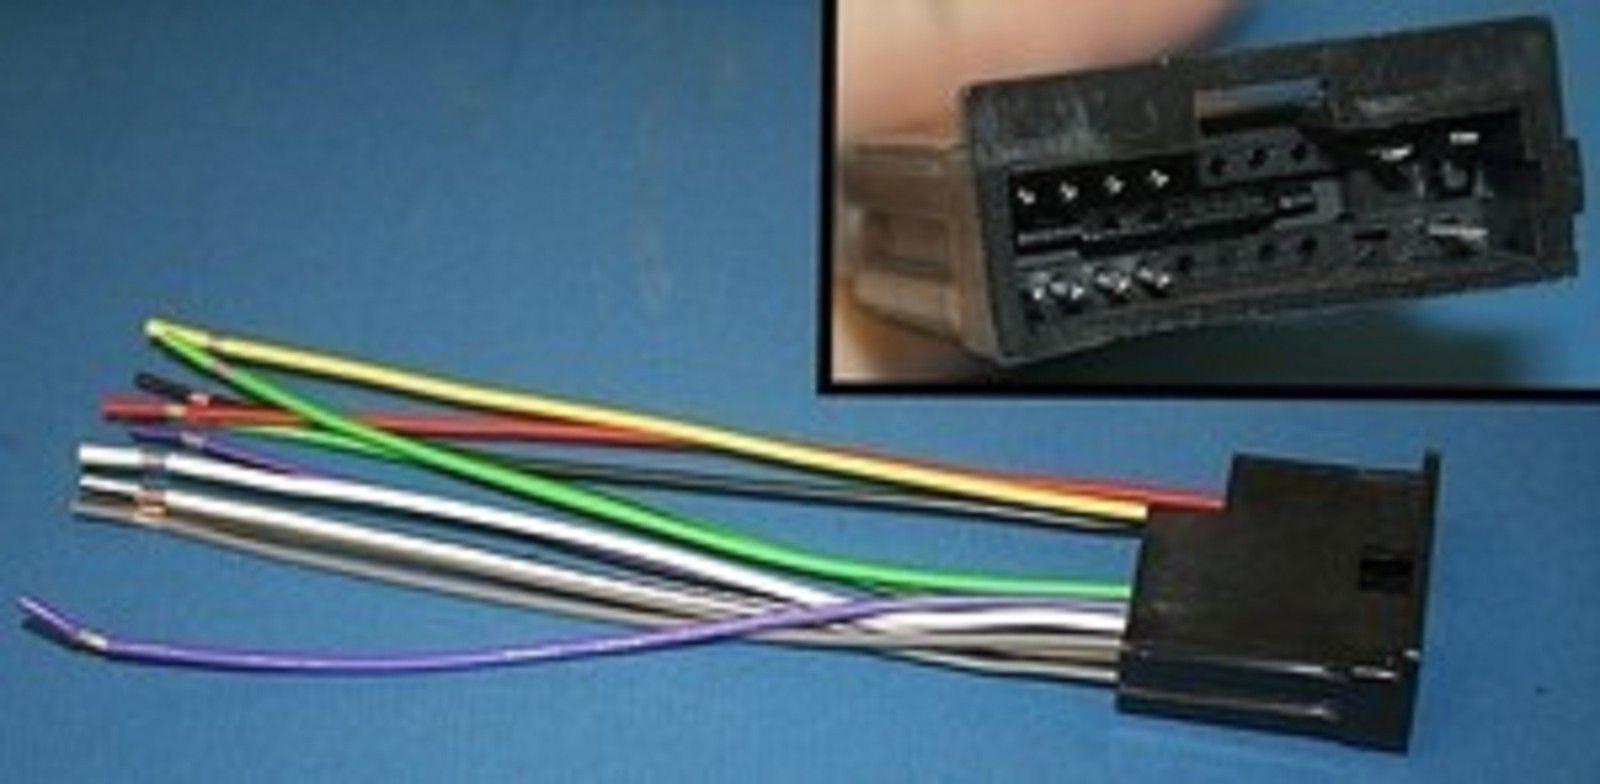 Vrx935vd Clarion Wiring Diagram Wikie Cloud Design Ideas Nx700e Harness Wire Center Source Diagramclarion Eqs746 Sm Service Manual Schematics